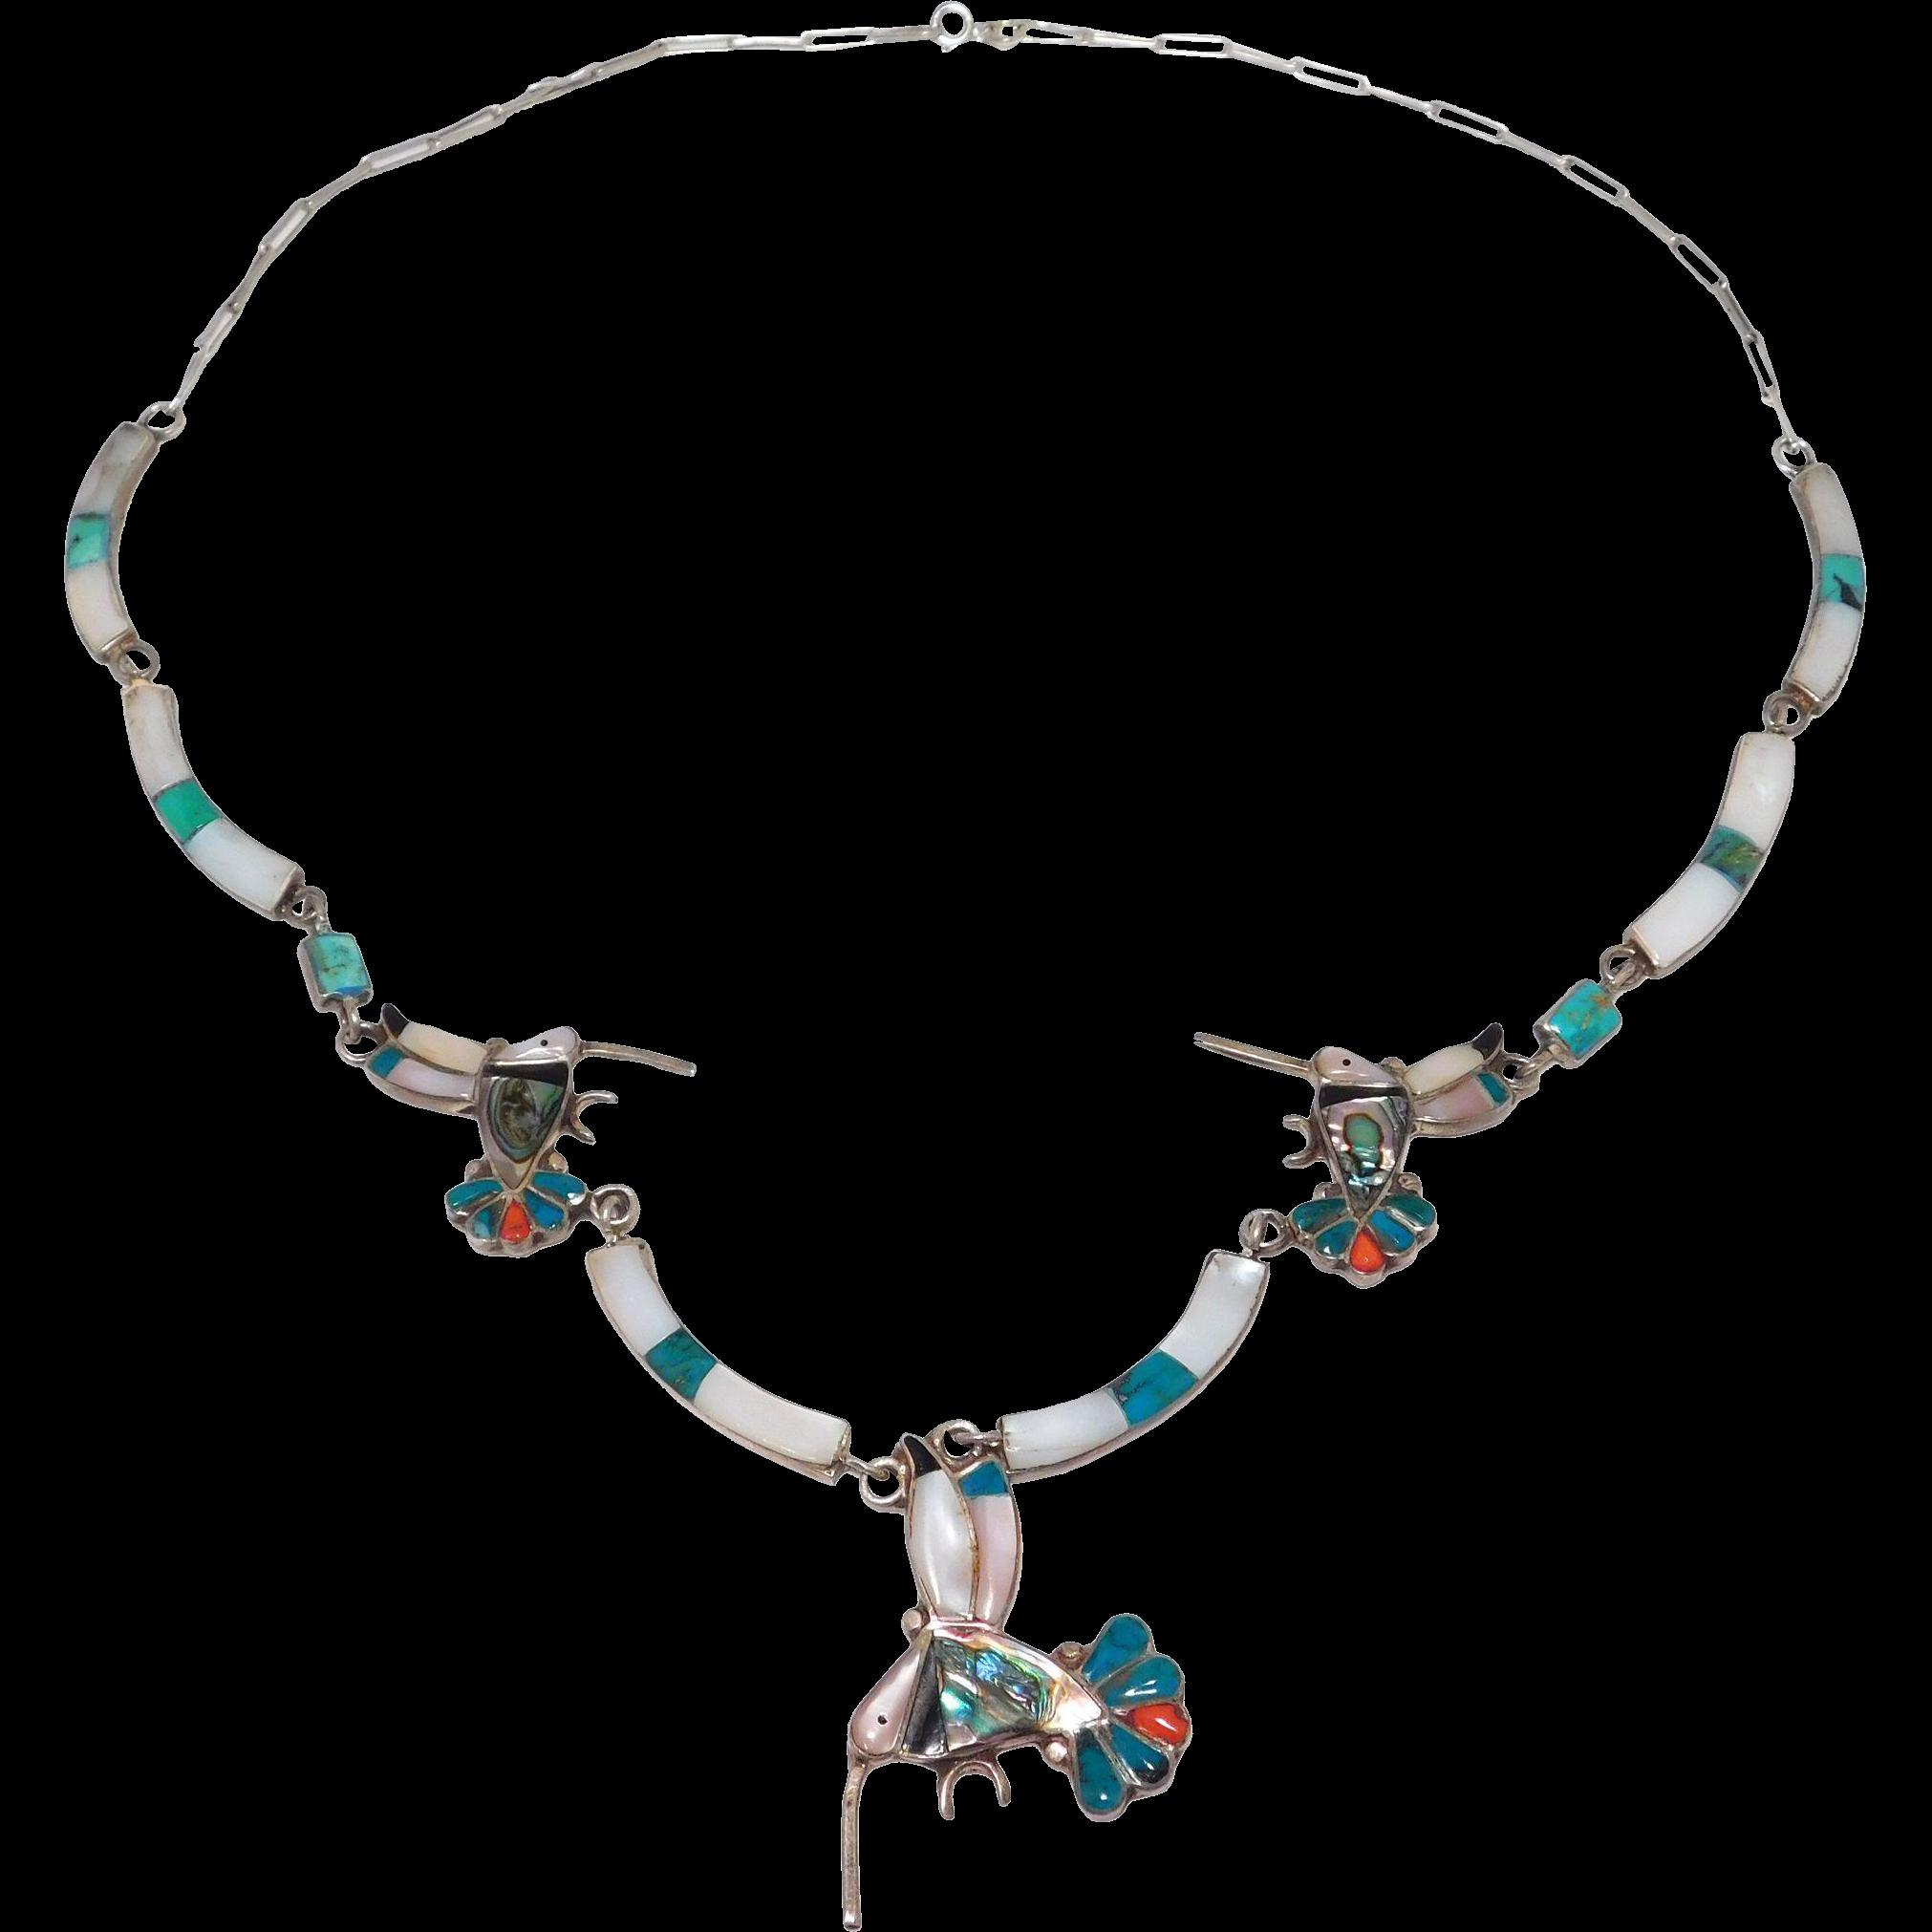 Ornate Zuni Inlay Sterling Necklace Hummingbird Design Silver